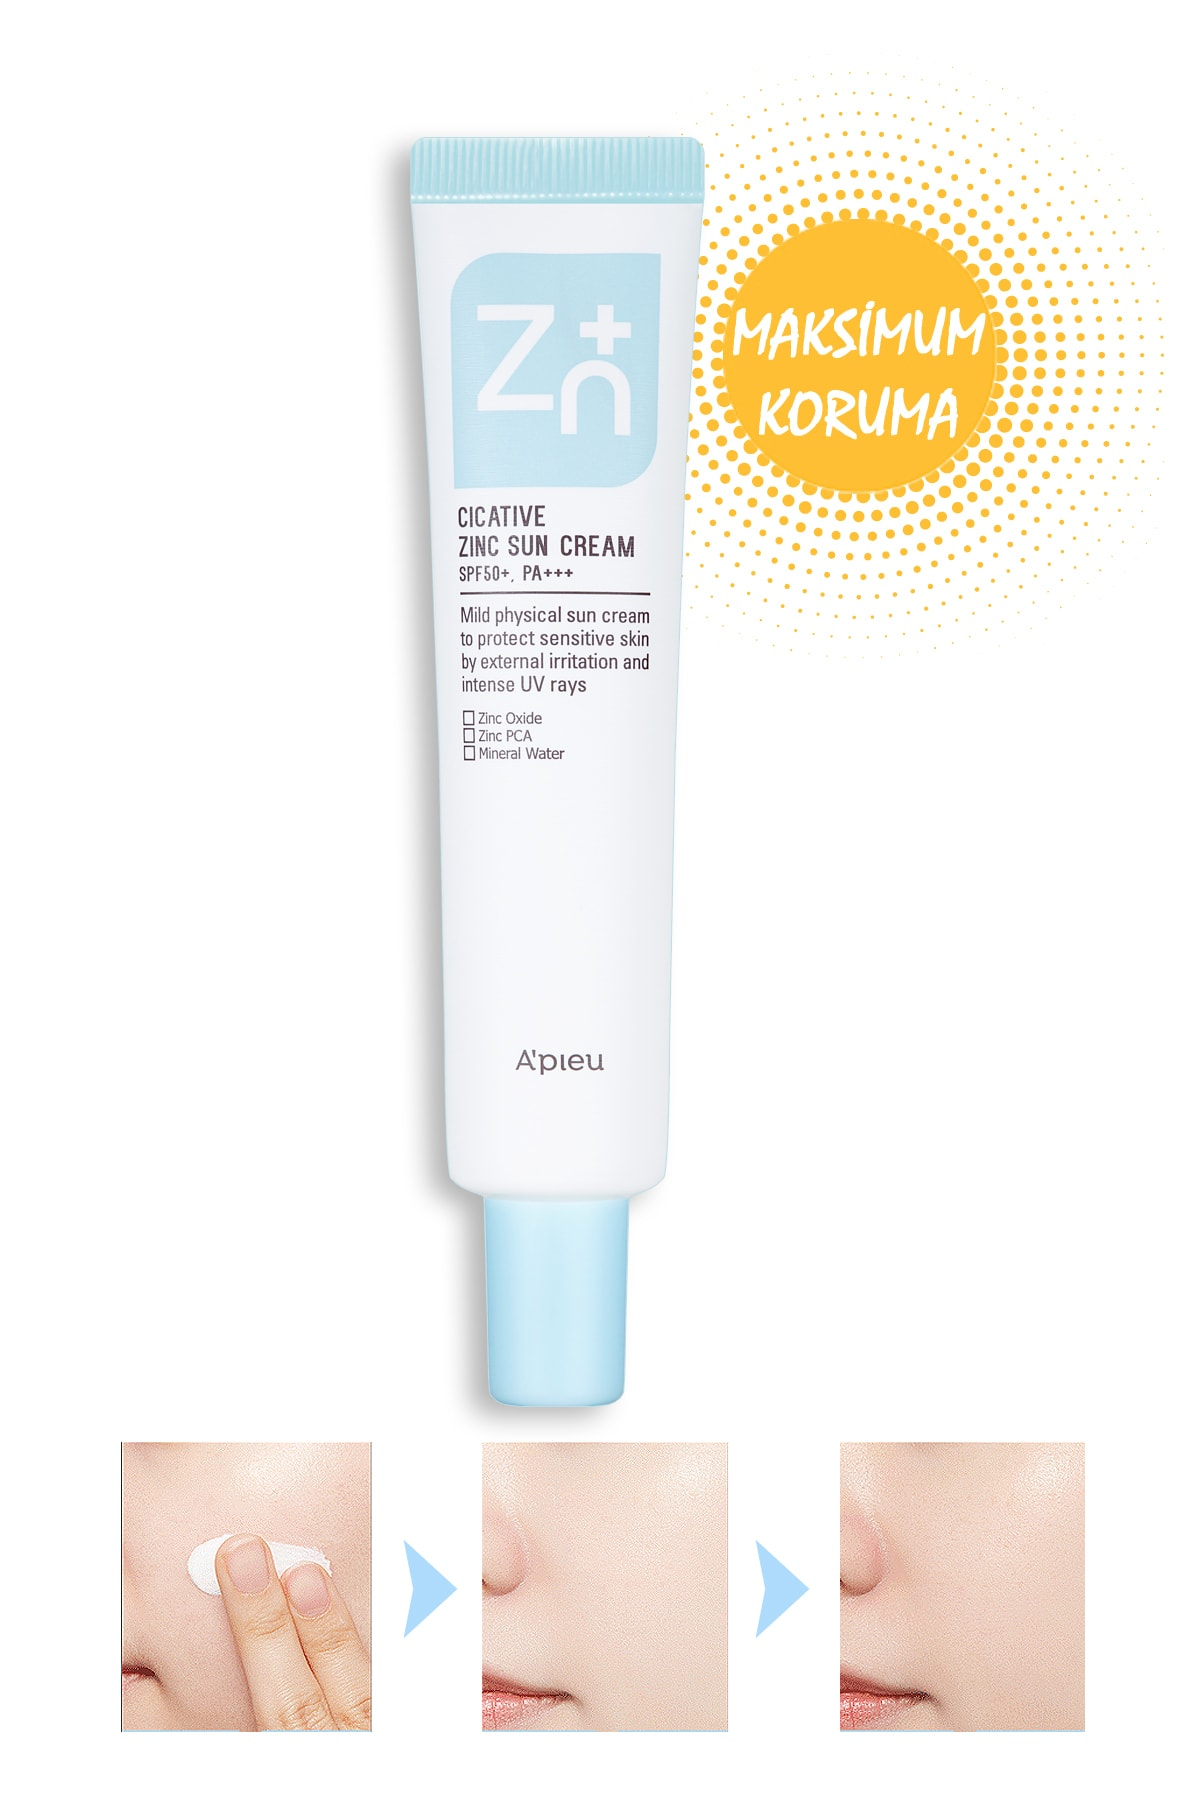 Çinko İçerikli Mineral Güneş Koruyucu SPF50+/PA++++ 40g APIEU Cicative Zinc Sun Cream SPF50+/PA++++